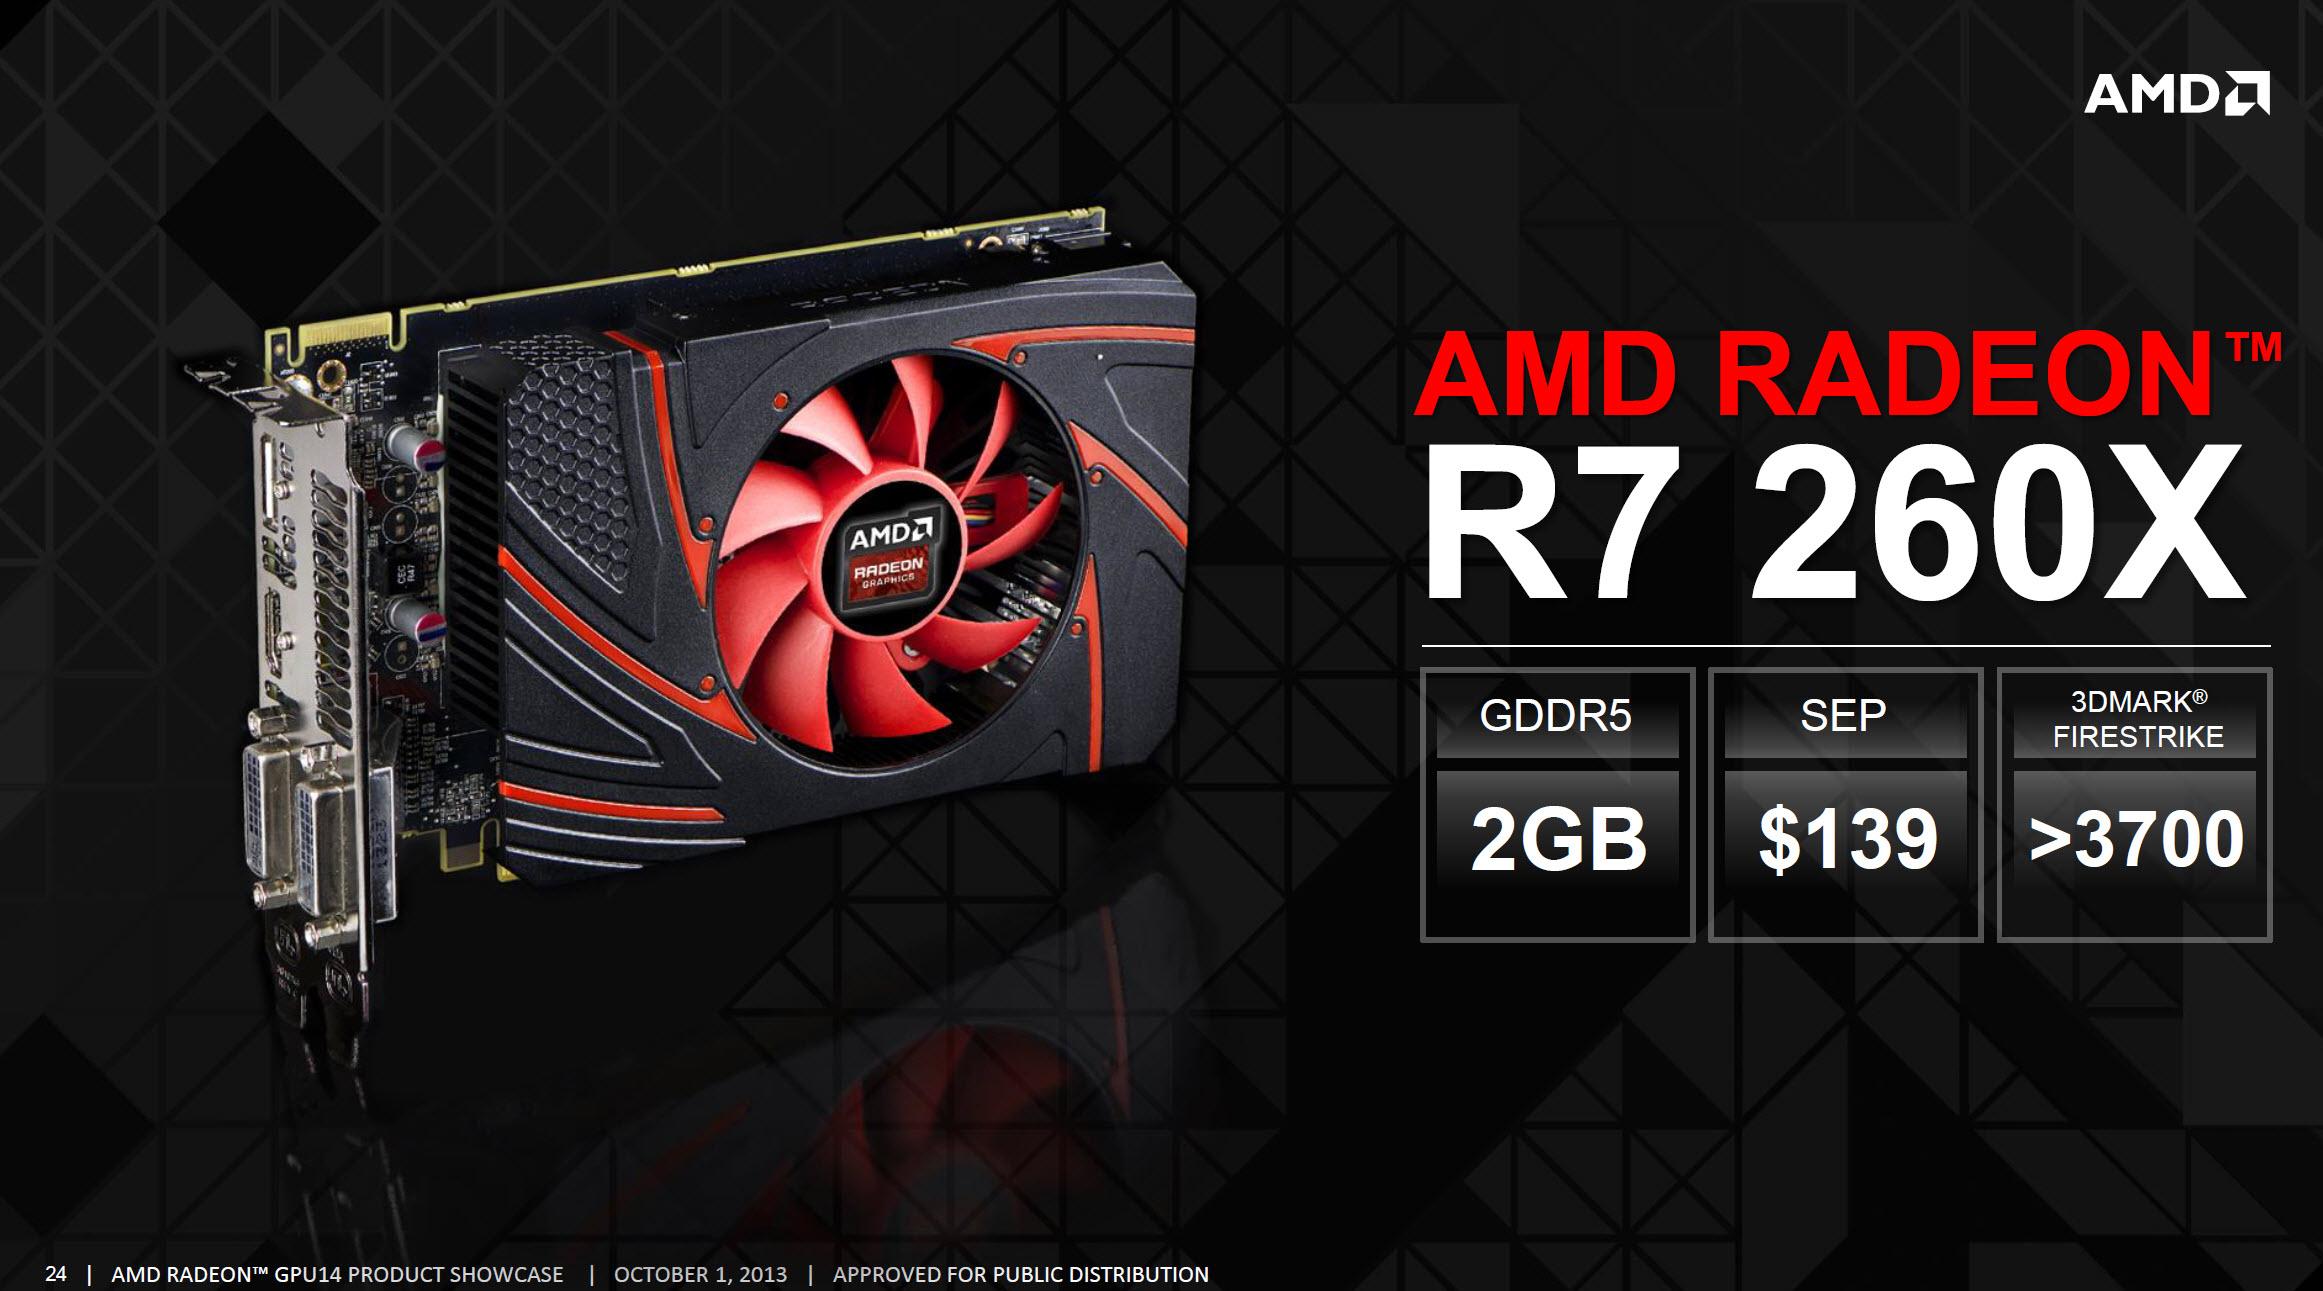 AMD Radeon R7 260X 2 GB 'Bonaire XTX' Graphics Card Review